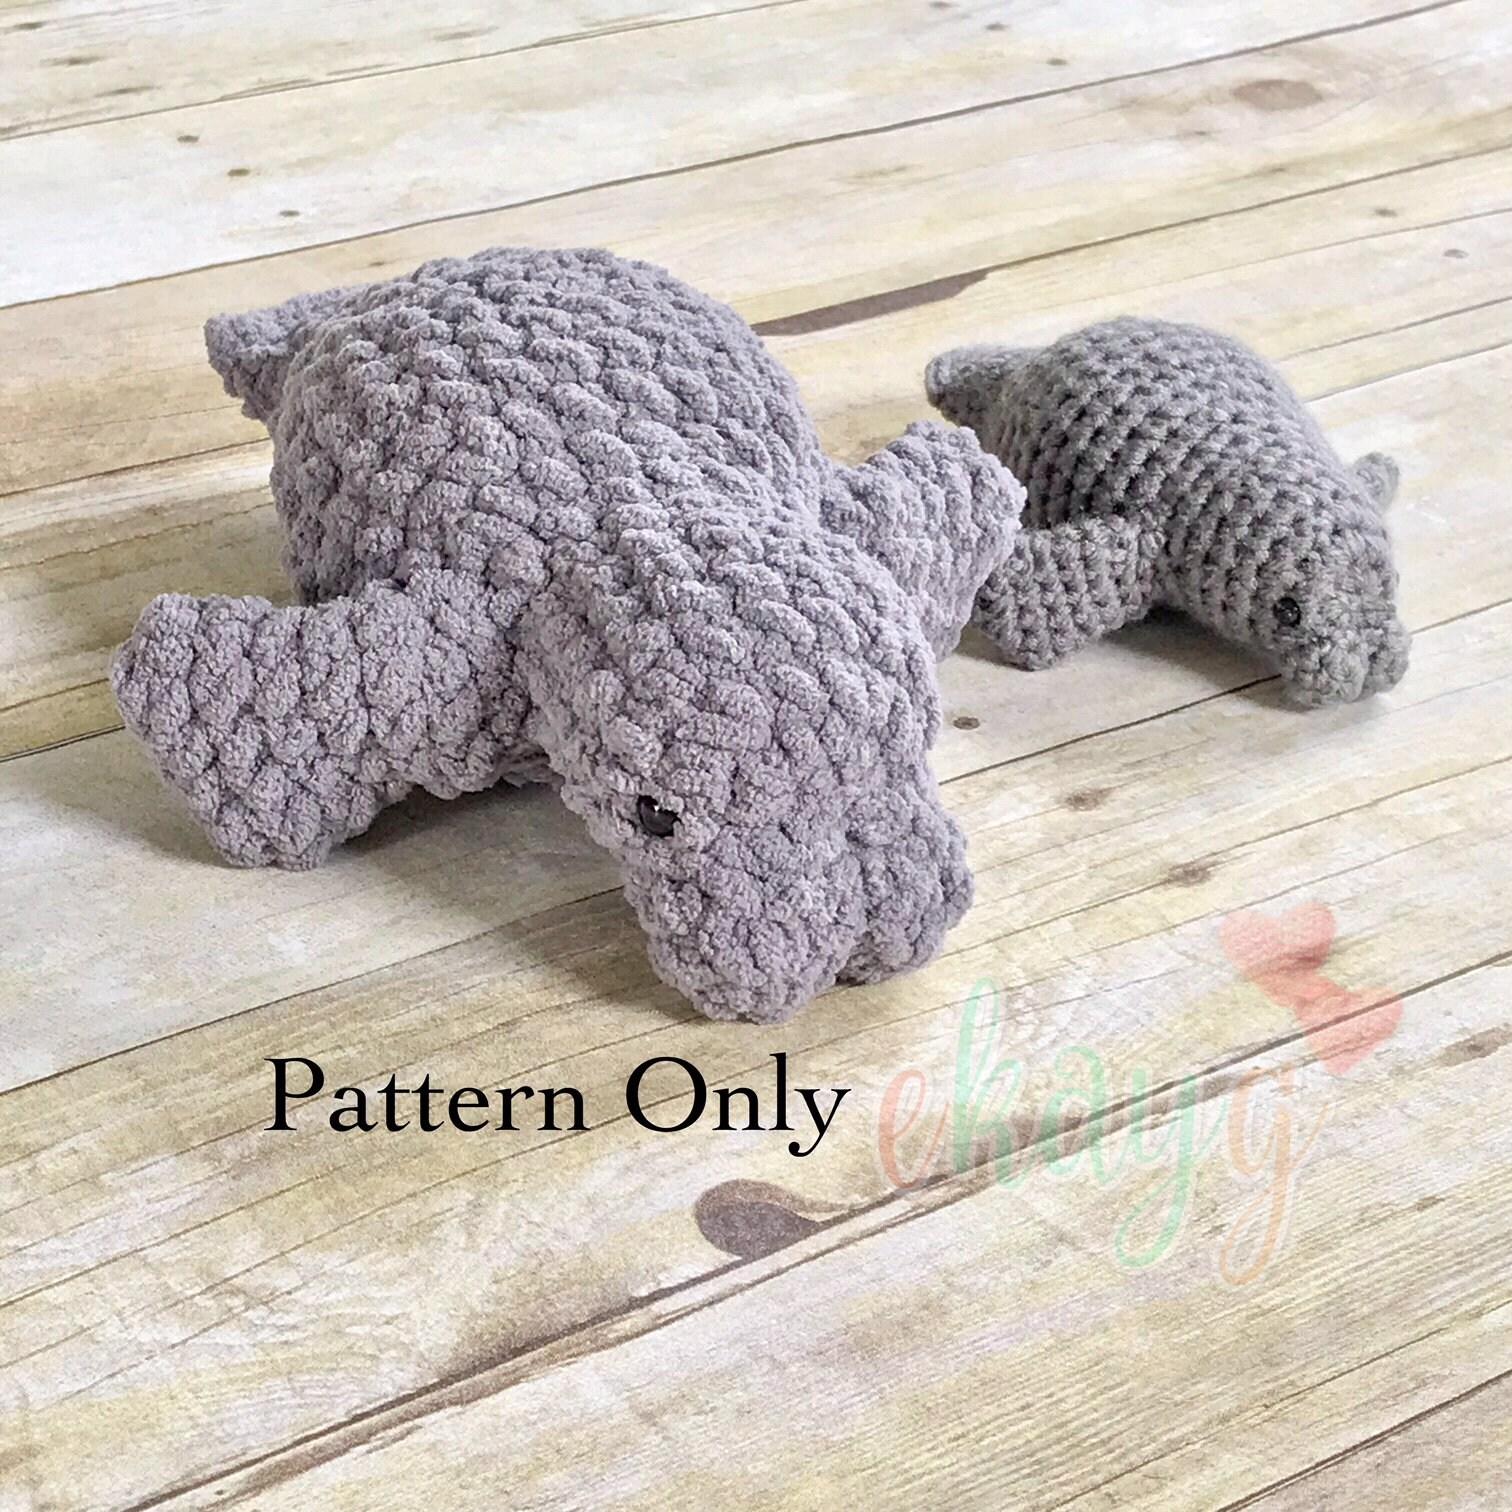 Fantastic Crochet Manatee Pattern Vignette - Sewing Pattern for ...